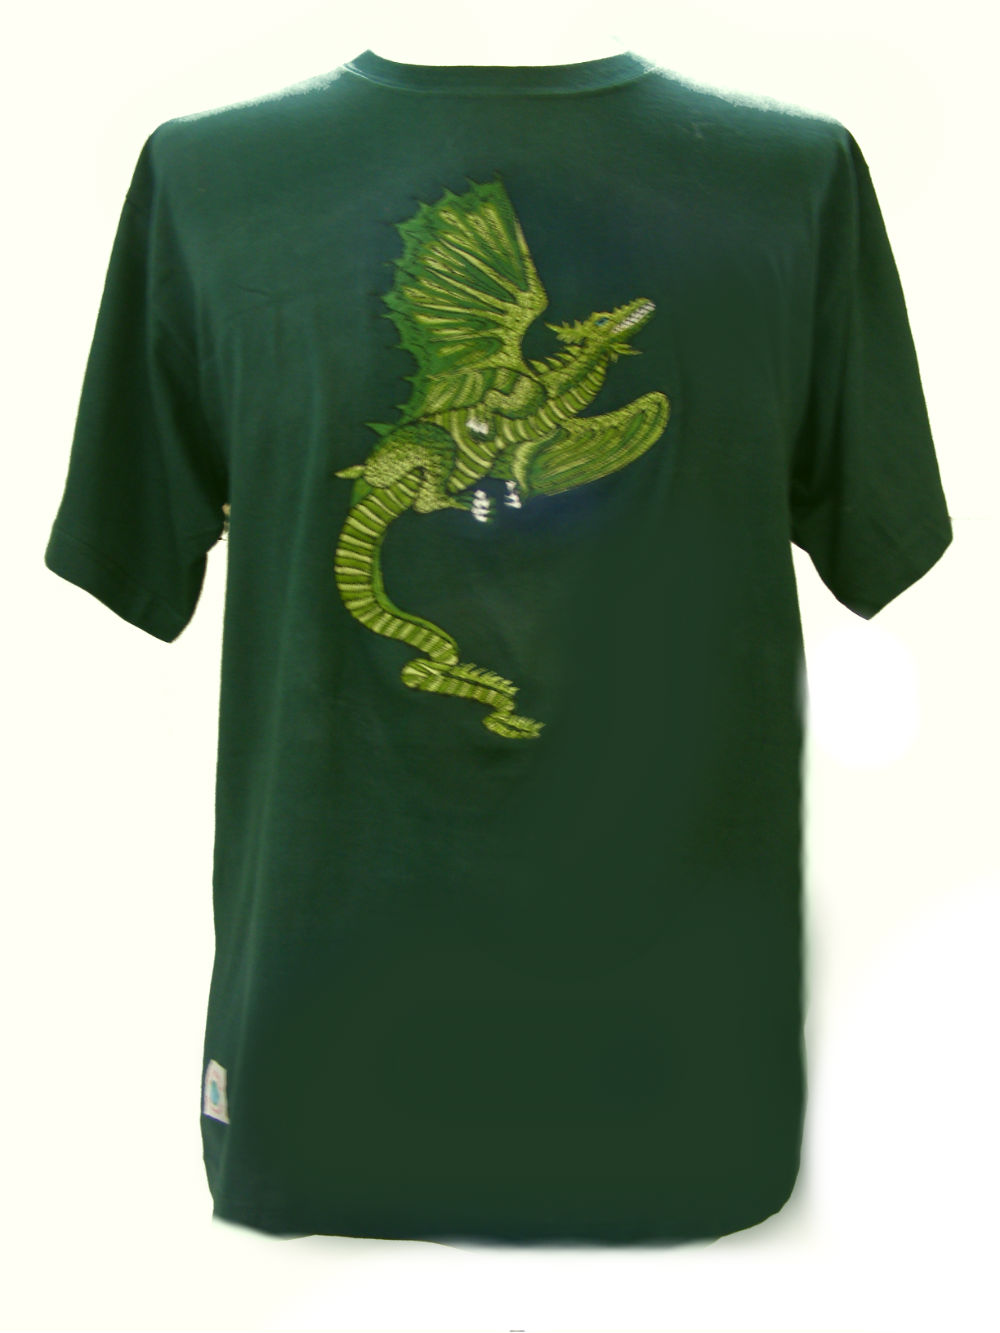 Fair Trade Embroidered Green Dragon T Shirt Green T Shirt